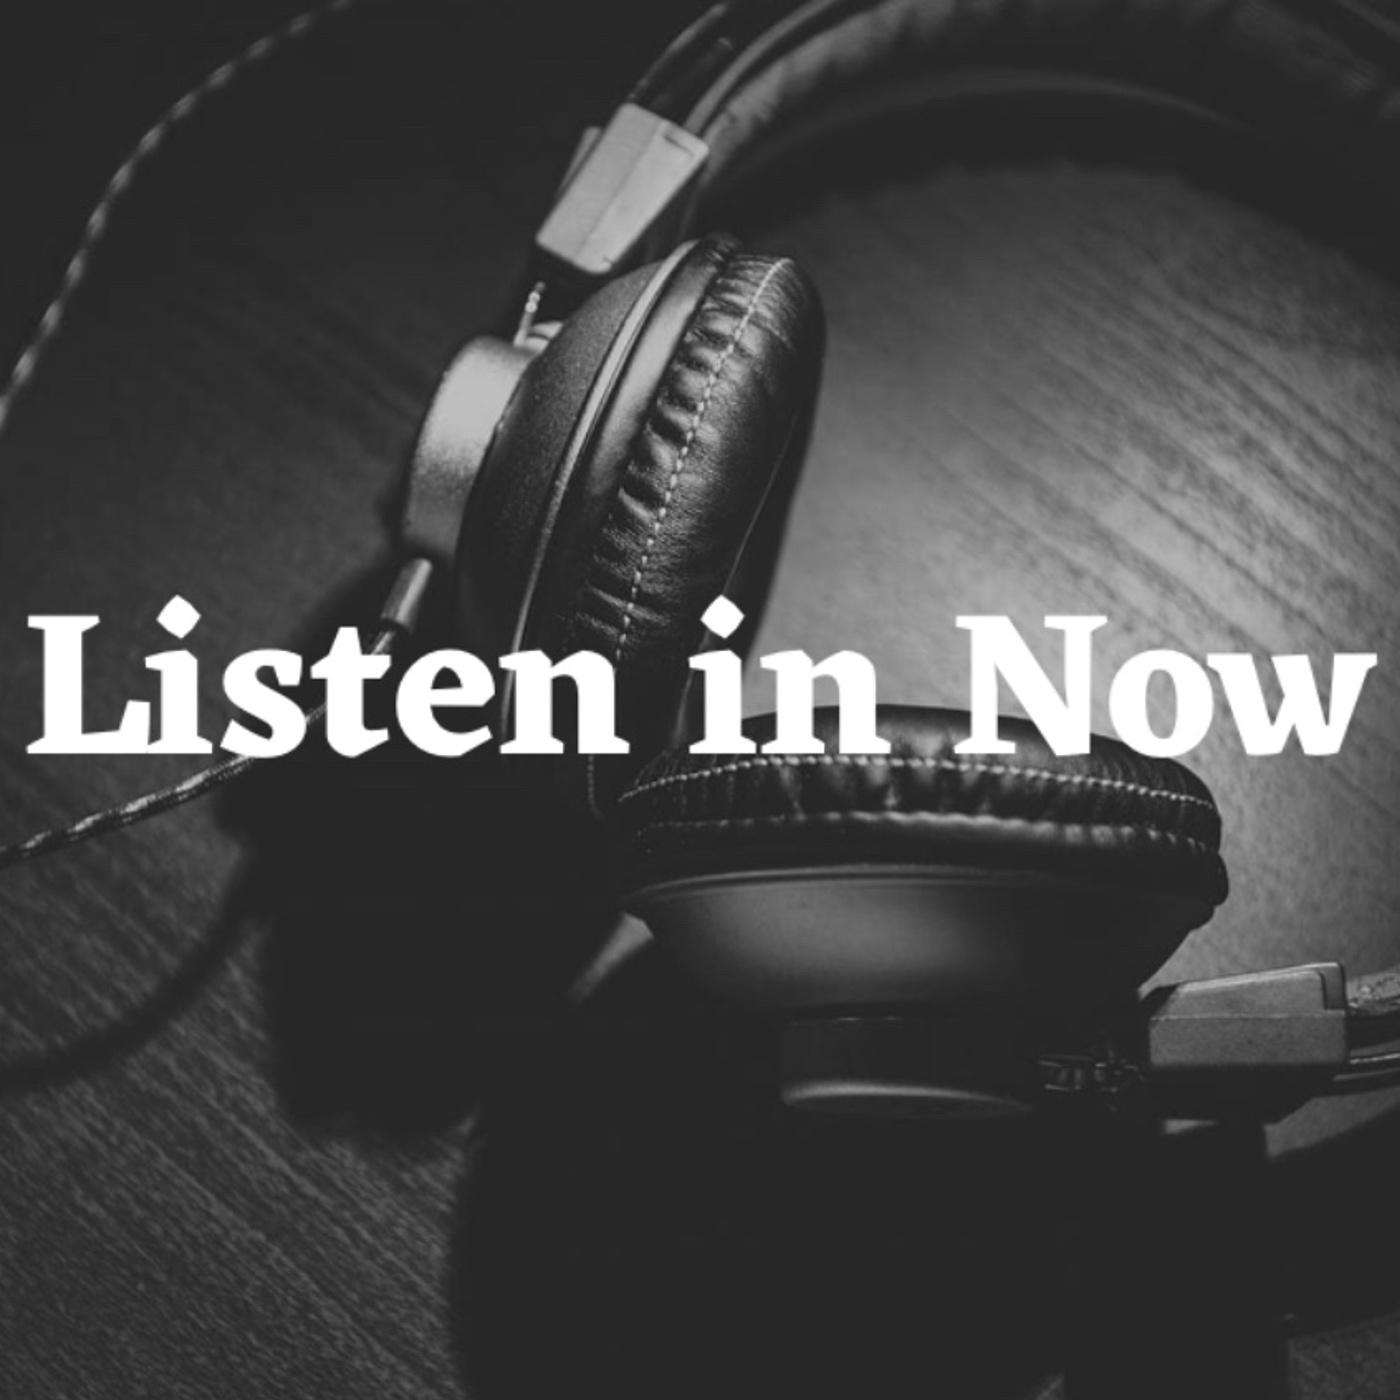 Jlnvumyqrufy50zbp4ma listen in now